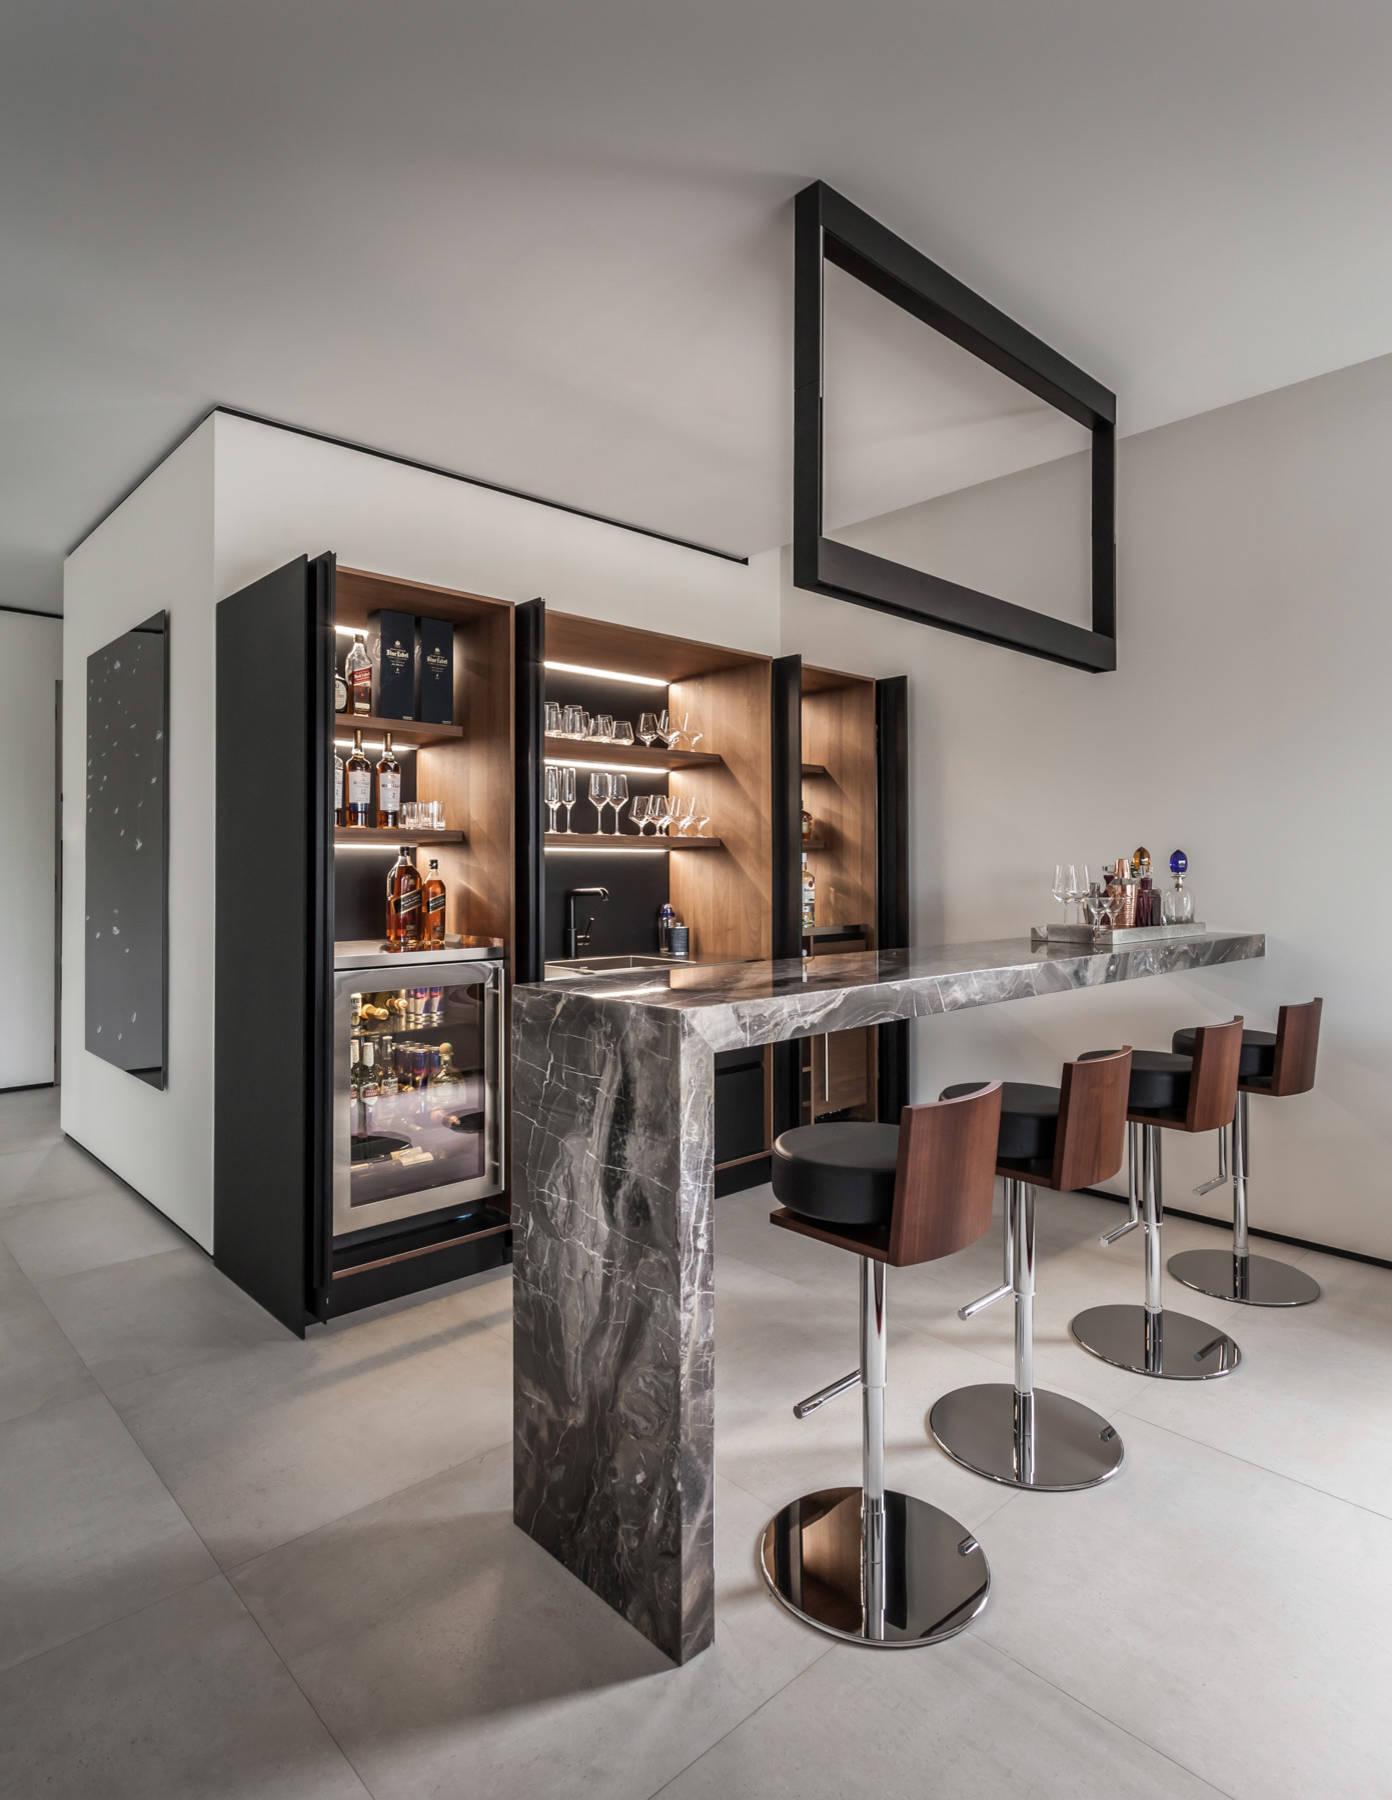 75 Beautiful Contemporary Home Bar Pictures Ideas November 2020 Houzz